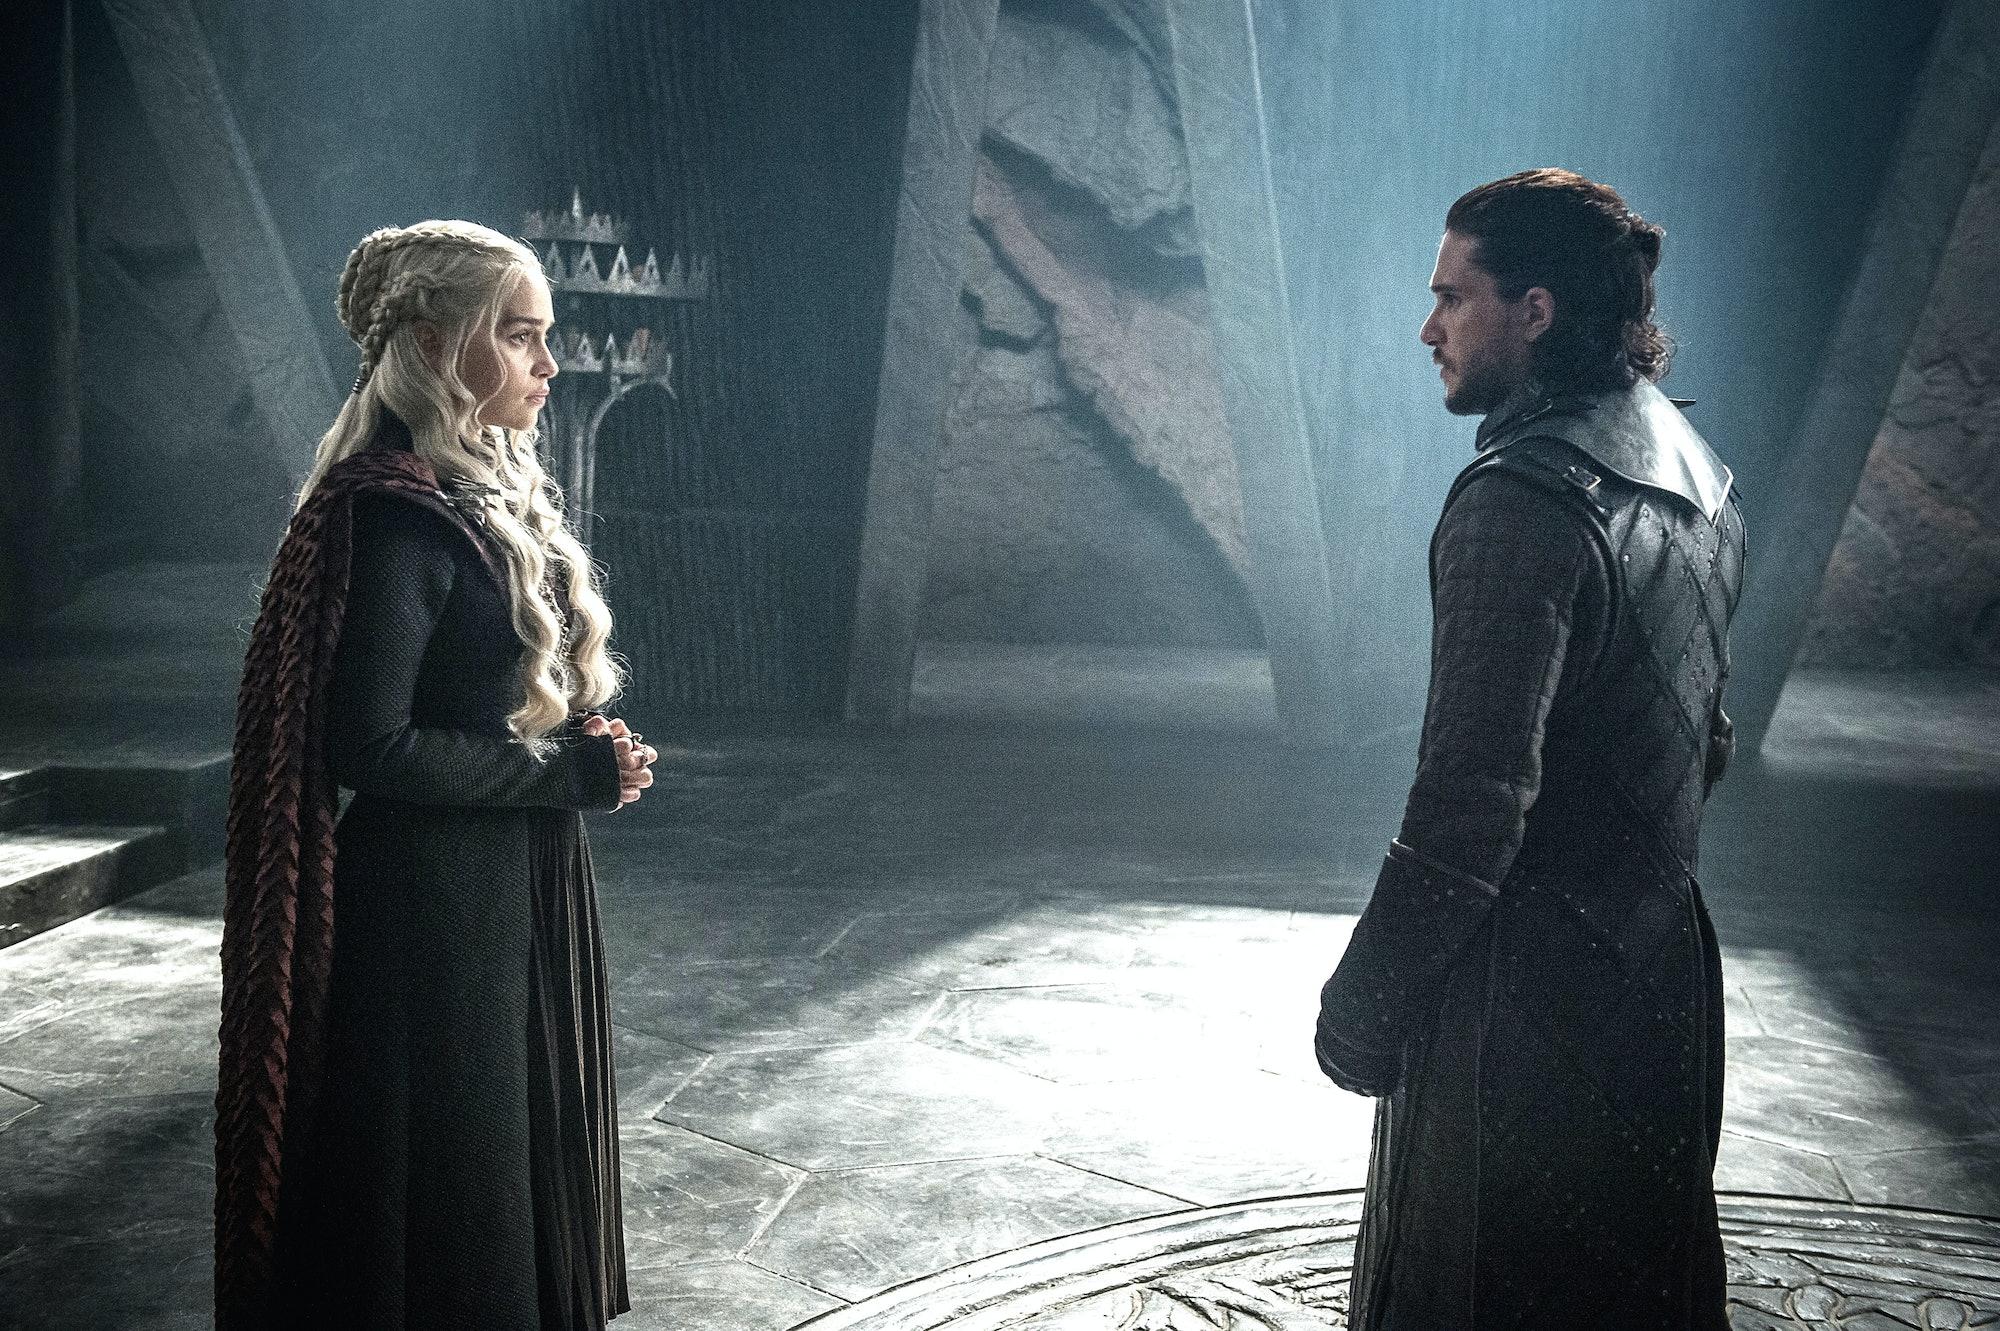 Kit Harington and Emilia Clarke in 'Game of Thrones' Season 7